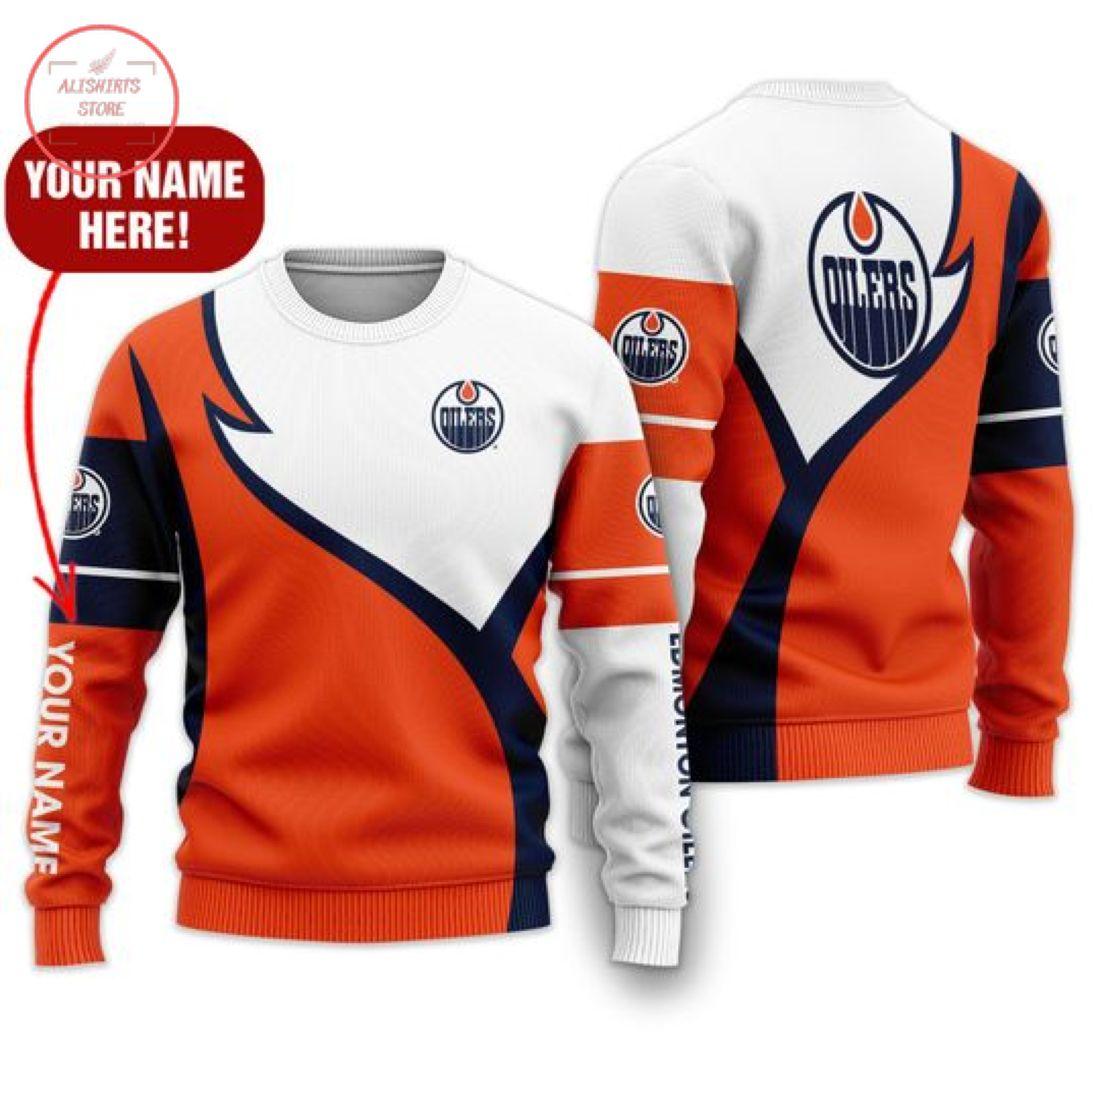 Nhl Edmonton Oilers Personalized Shirts